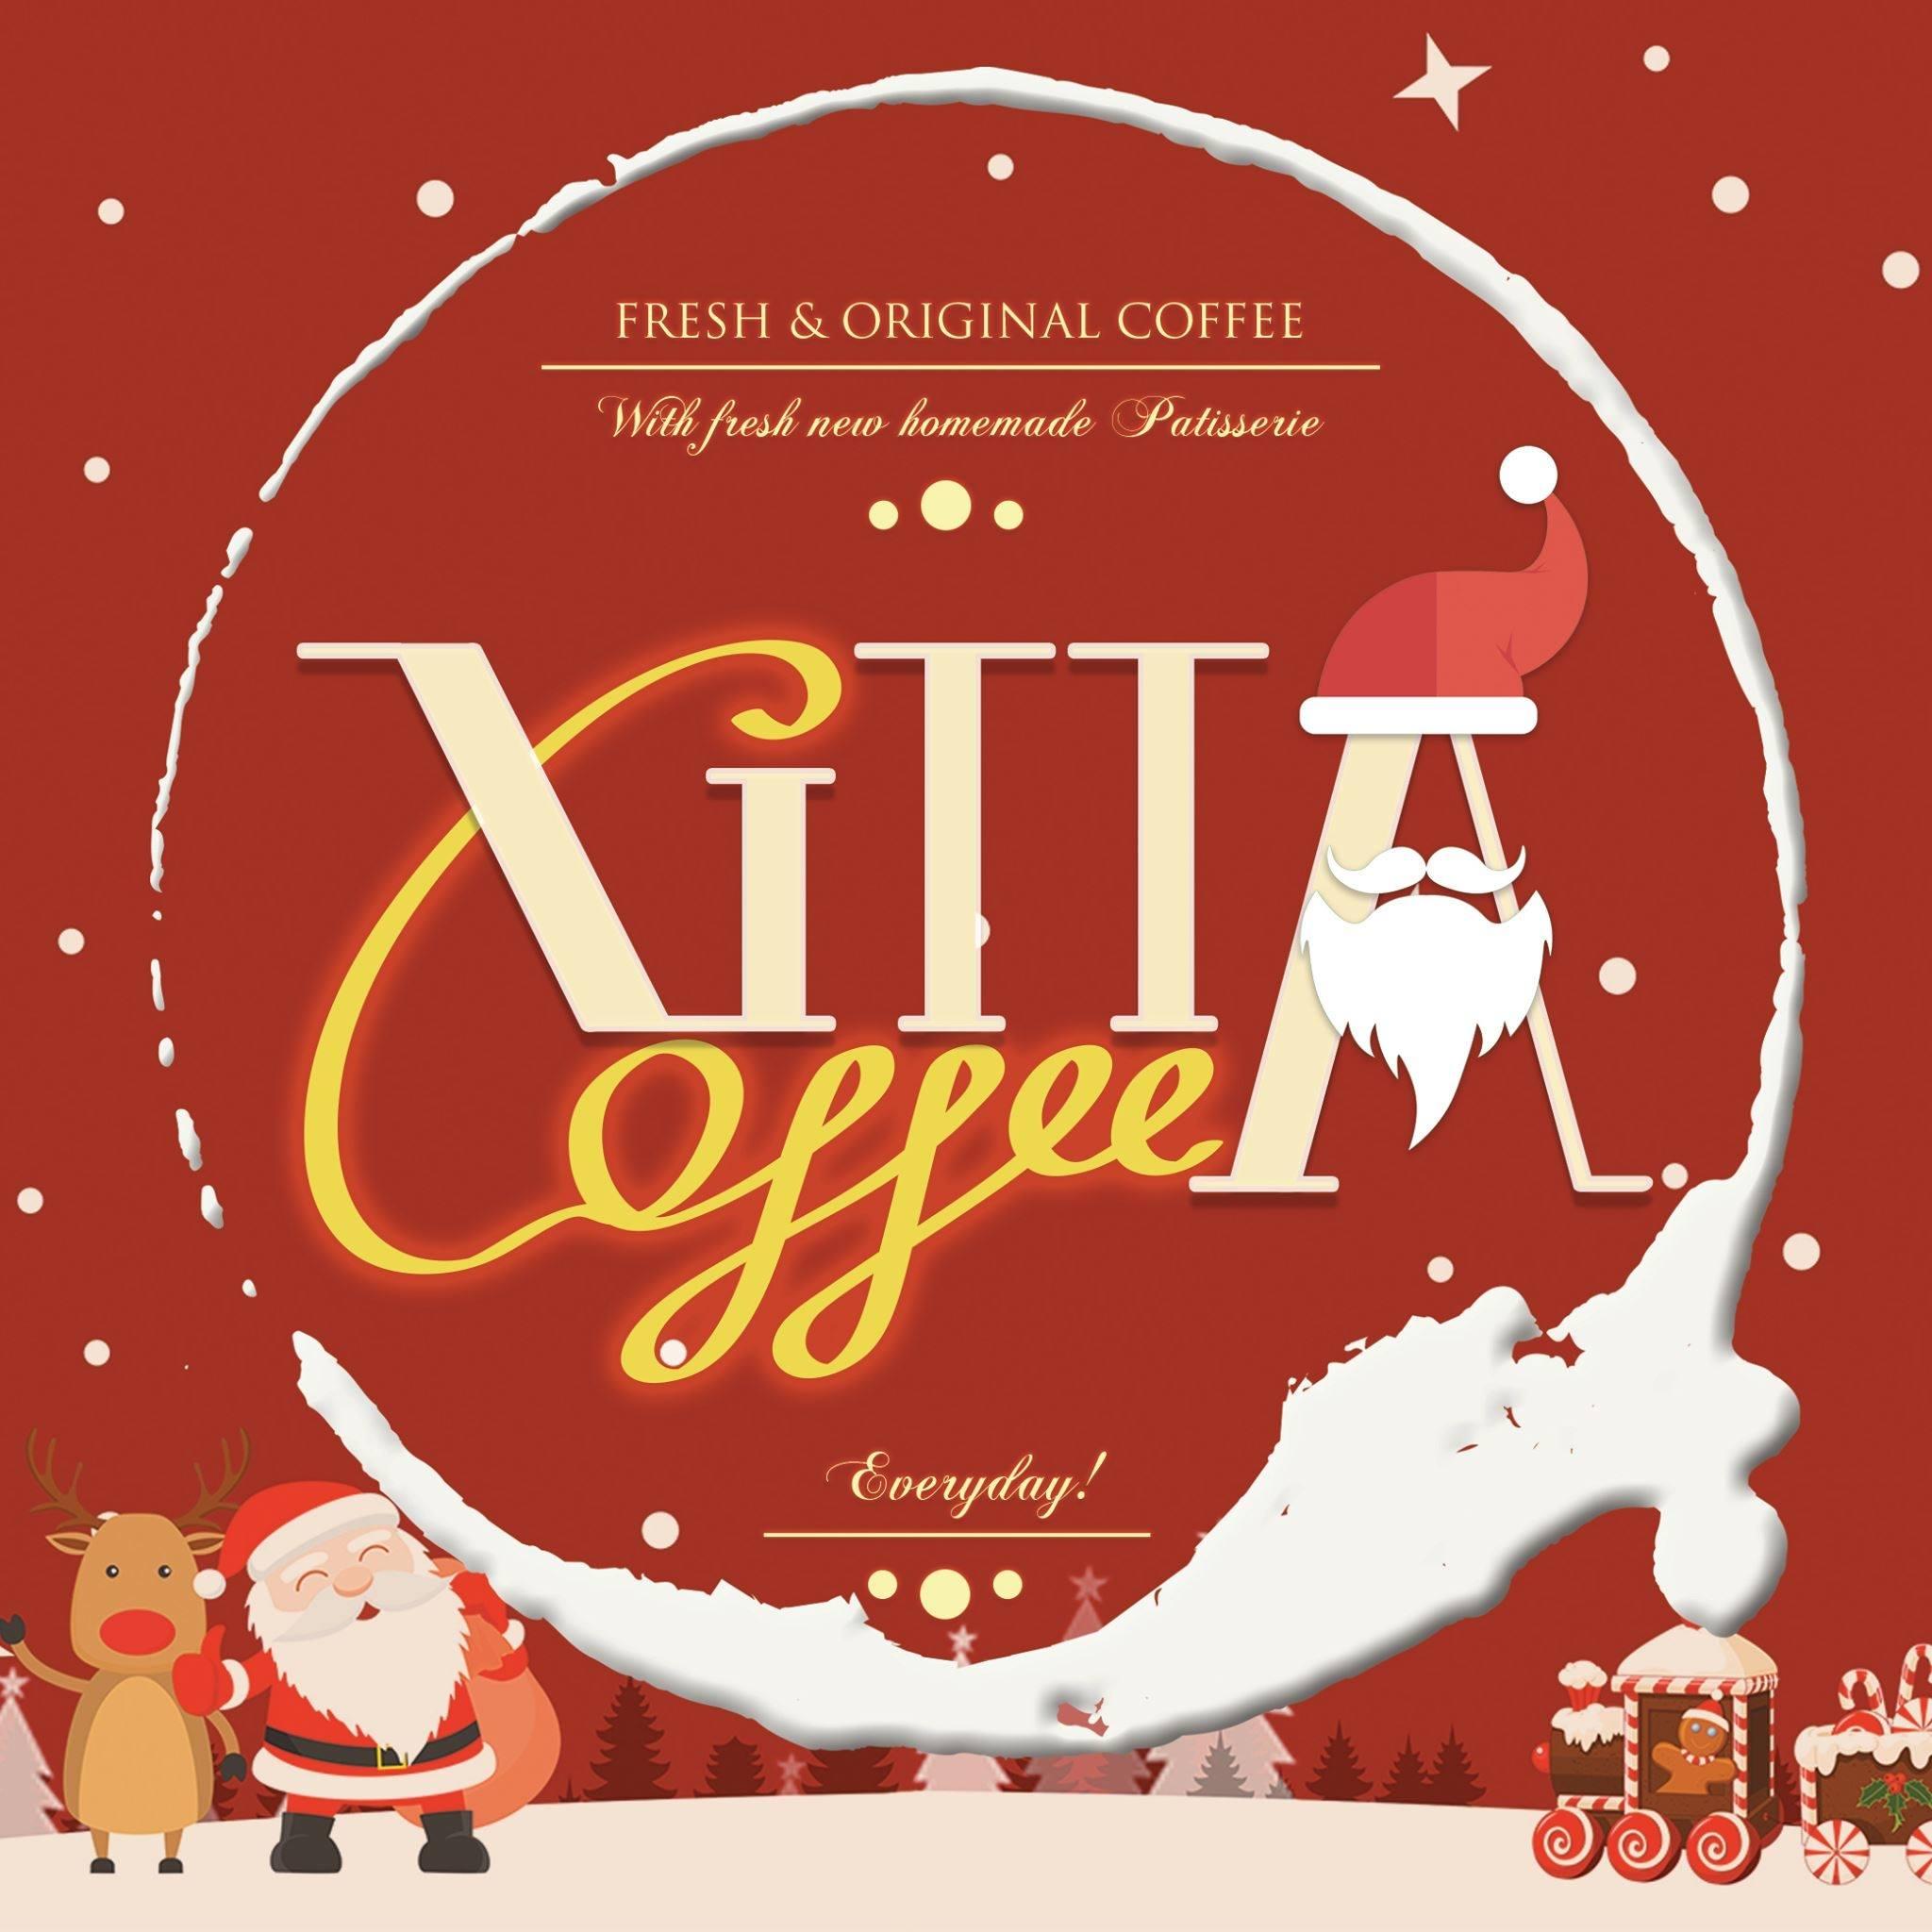 Xitta Coffee Shop